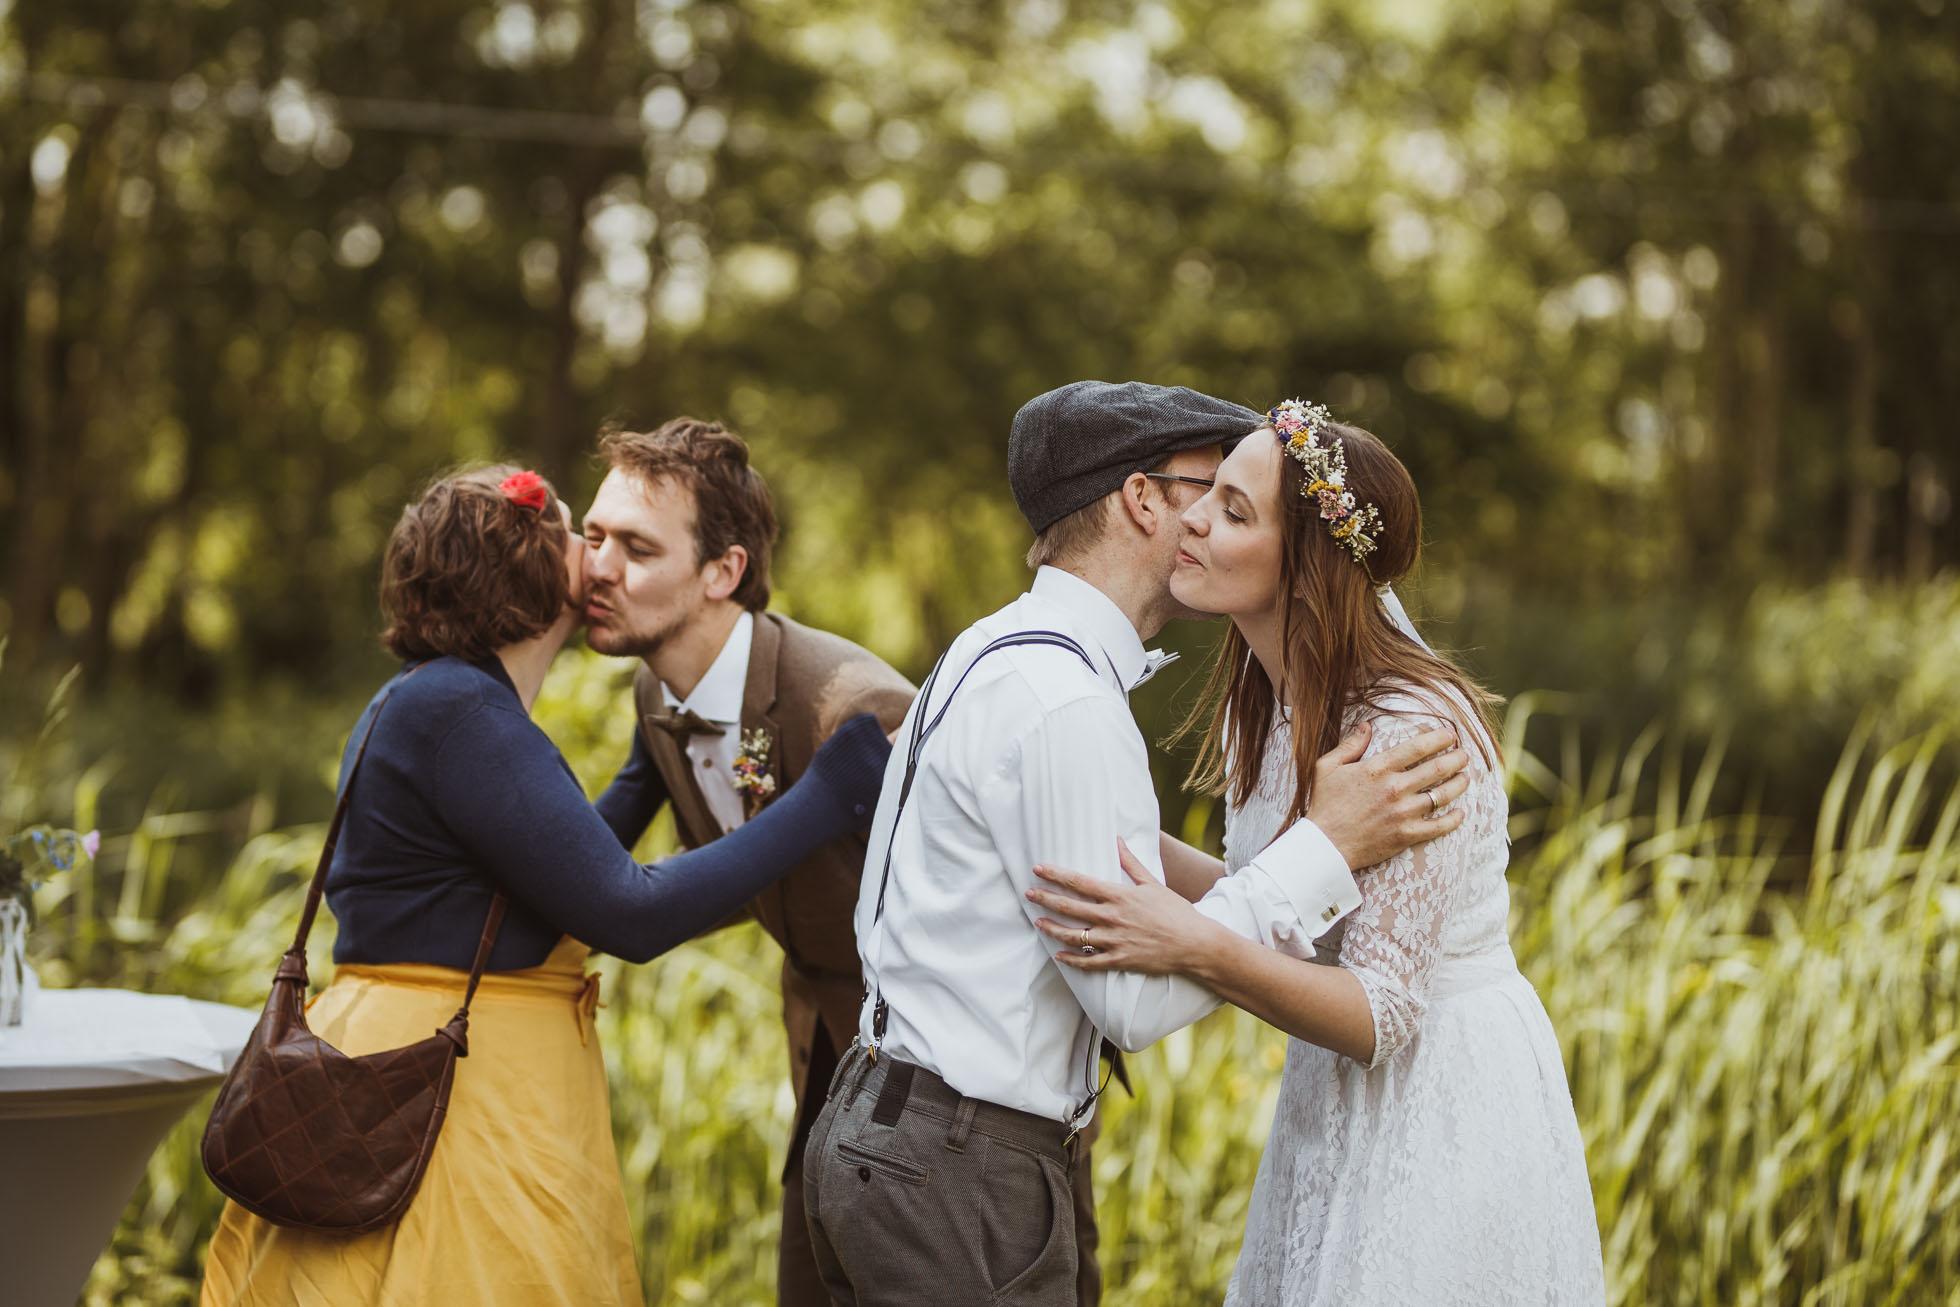 utrecht-wedding-photographer-82.jpg